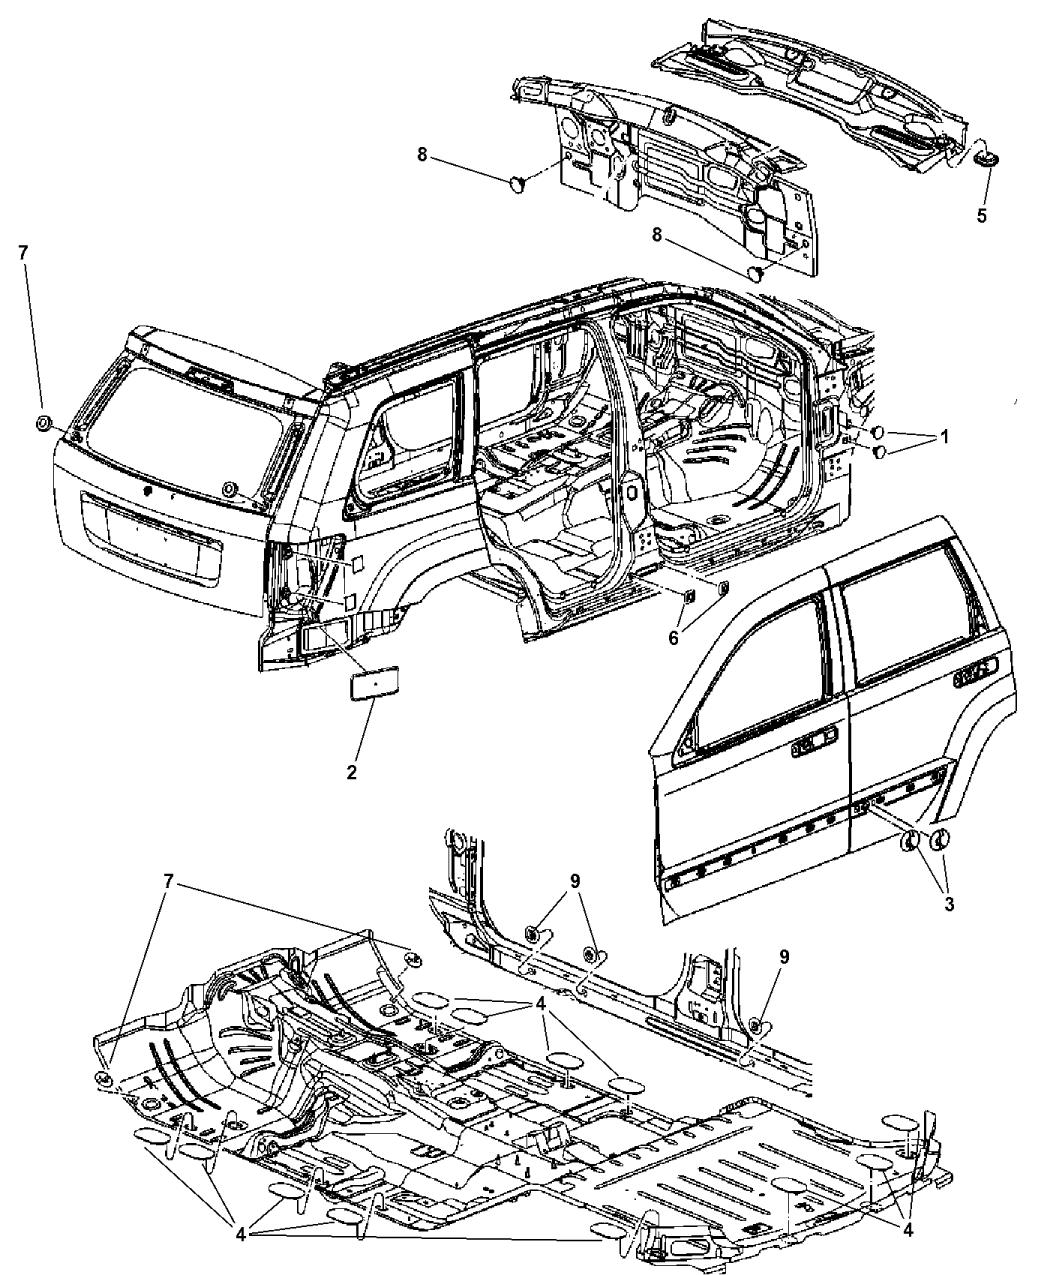 1999 jeep grand cherokee clock spring wiring diagram